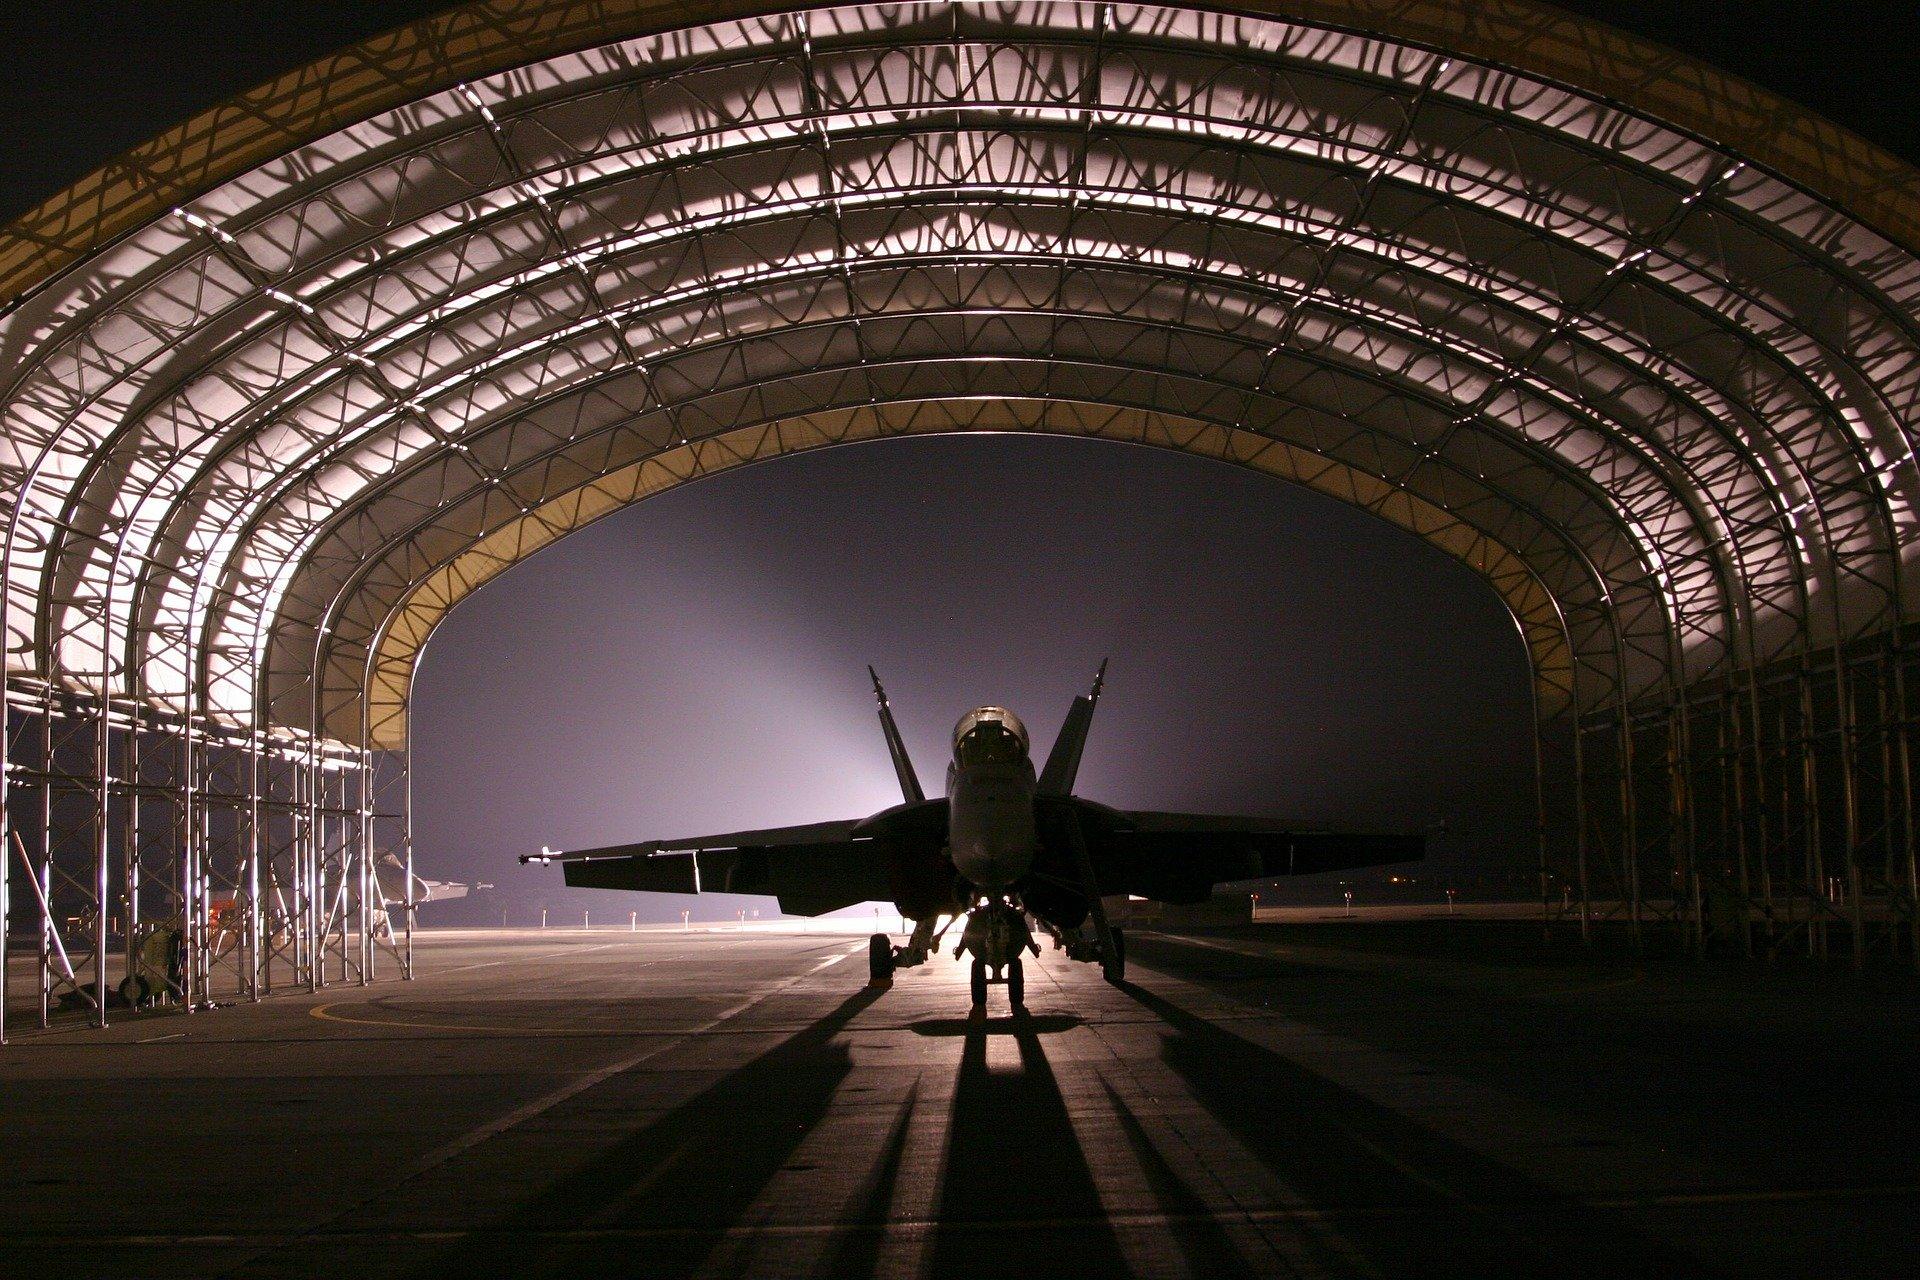 Recrutement des cadres de l'aéronautique